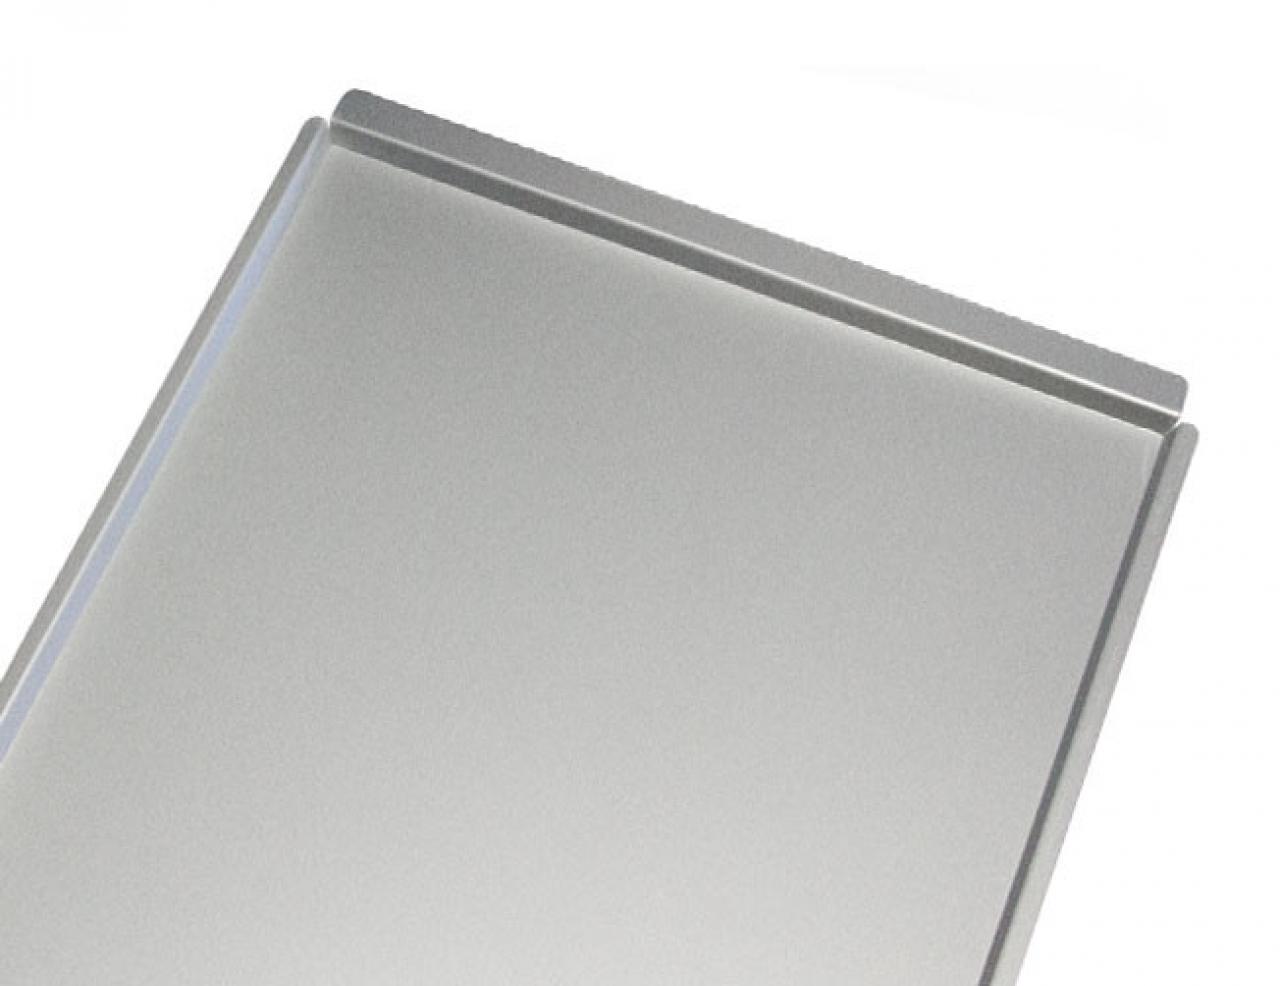 Baking plate aluminum 460x330